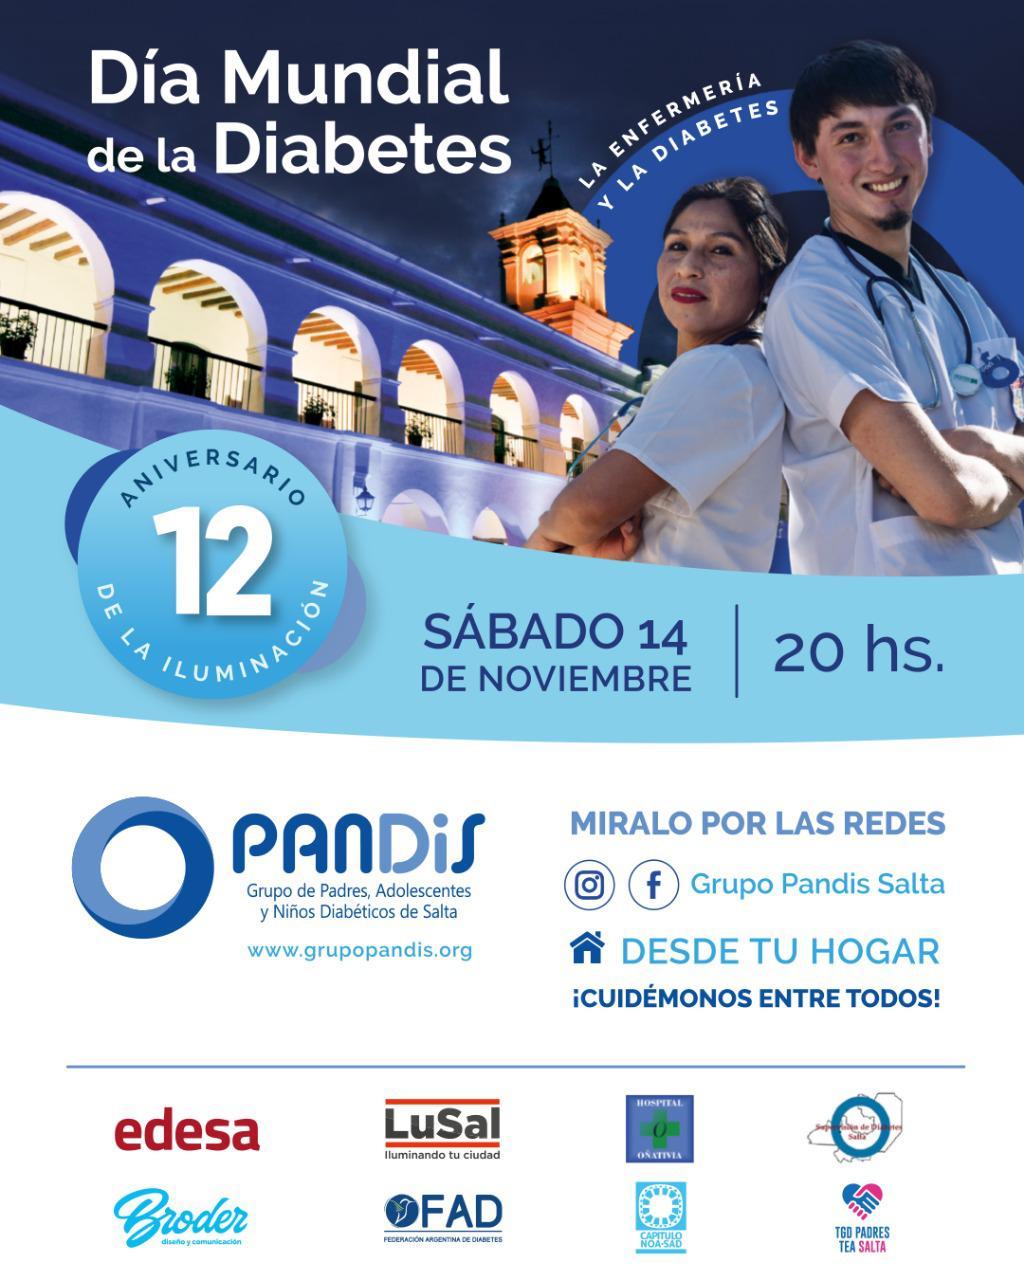 Dia Mundial de la Diabetes 2